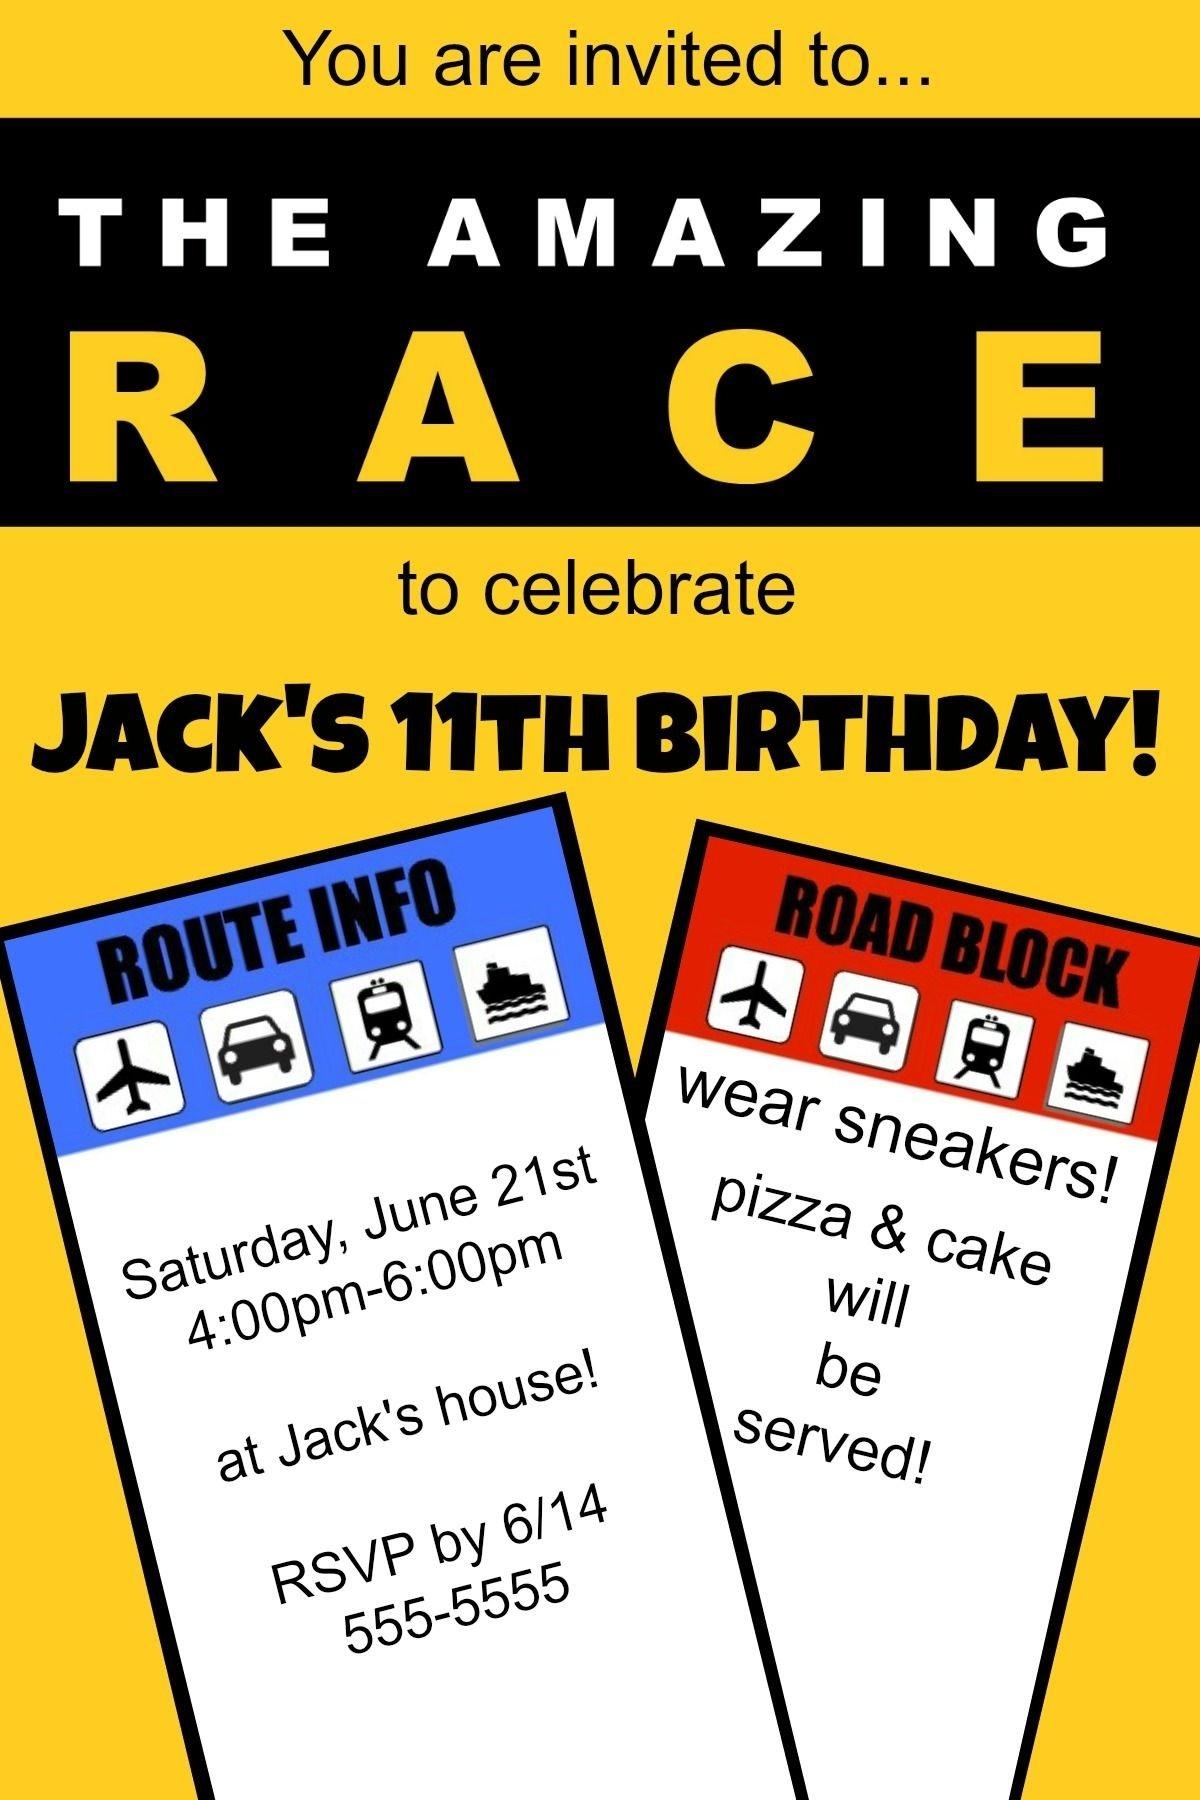 10 Wonderful Amazing Race Birthday Party Ideas how to host an amazing race birthday party at home amazing race 1 2020